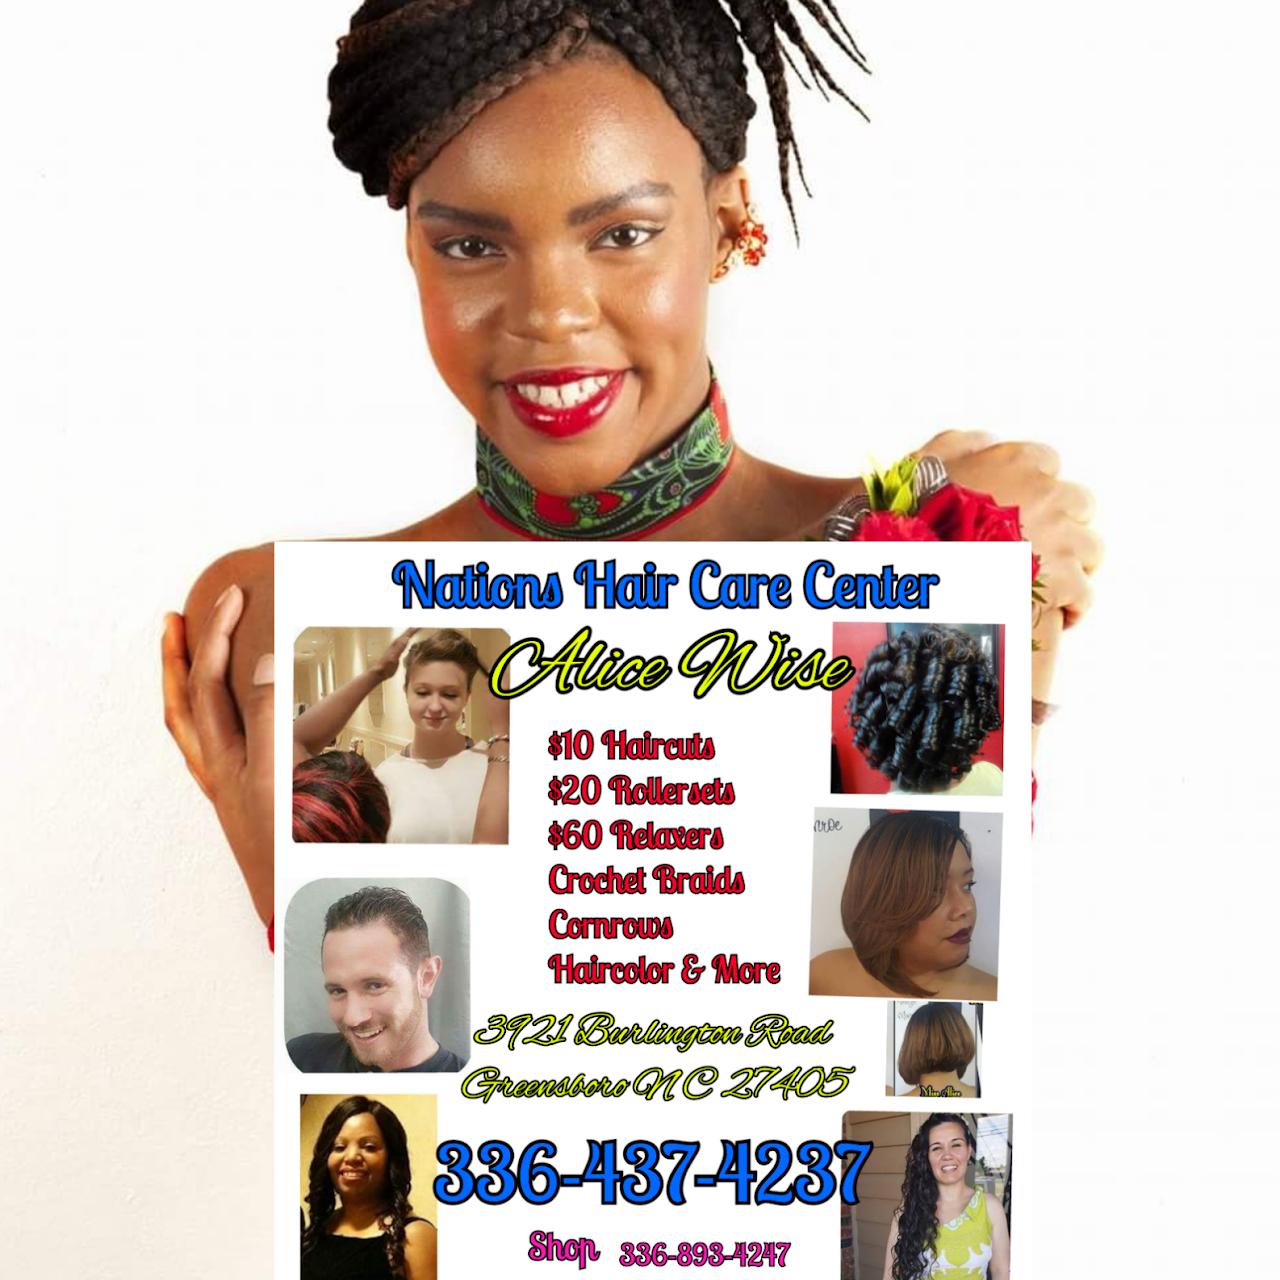 Nations Hair Care Center Hair Salon In Greensboro